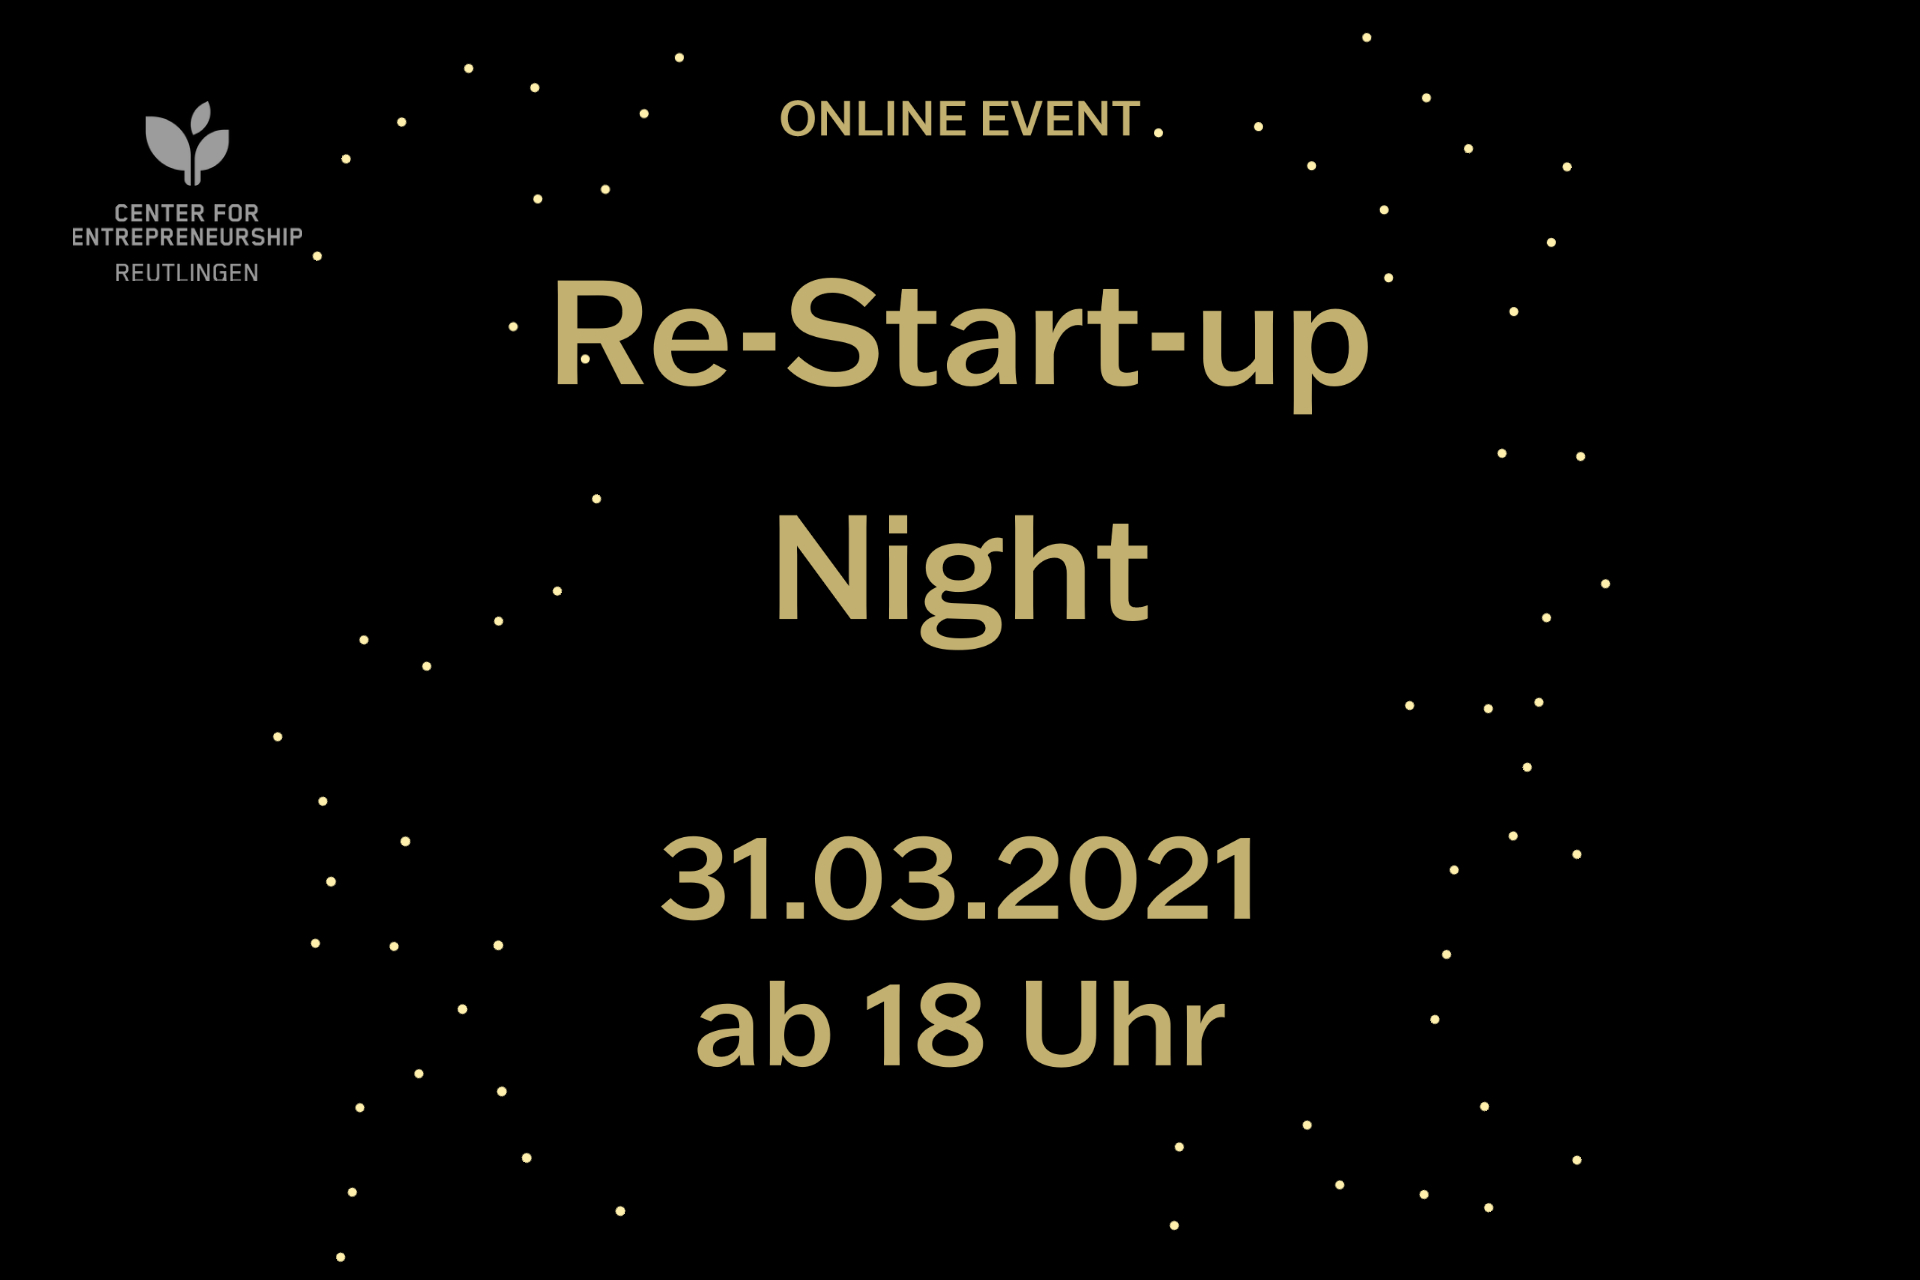 Re-Start-up Night